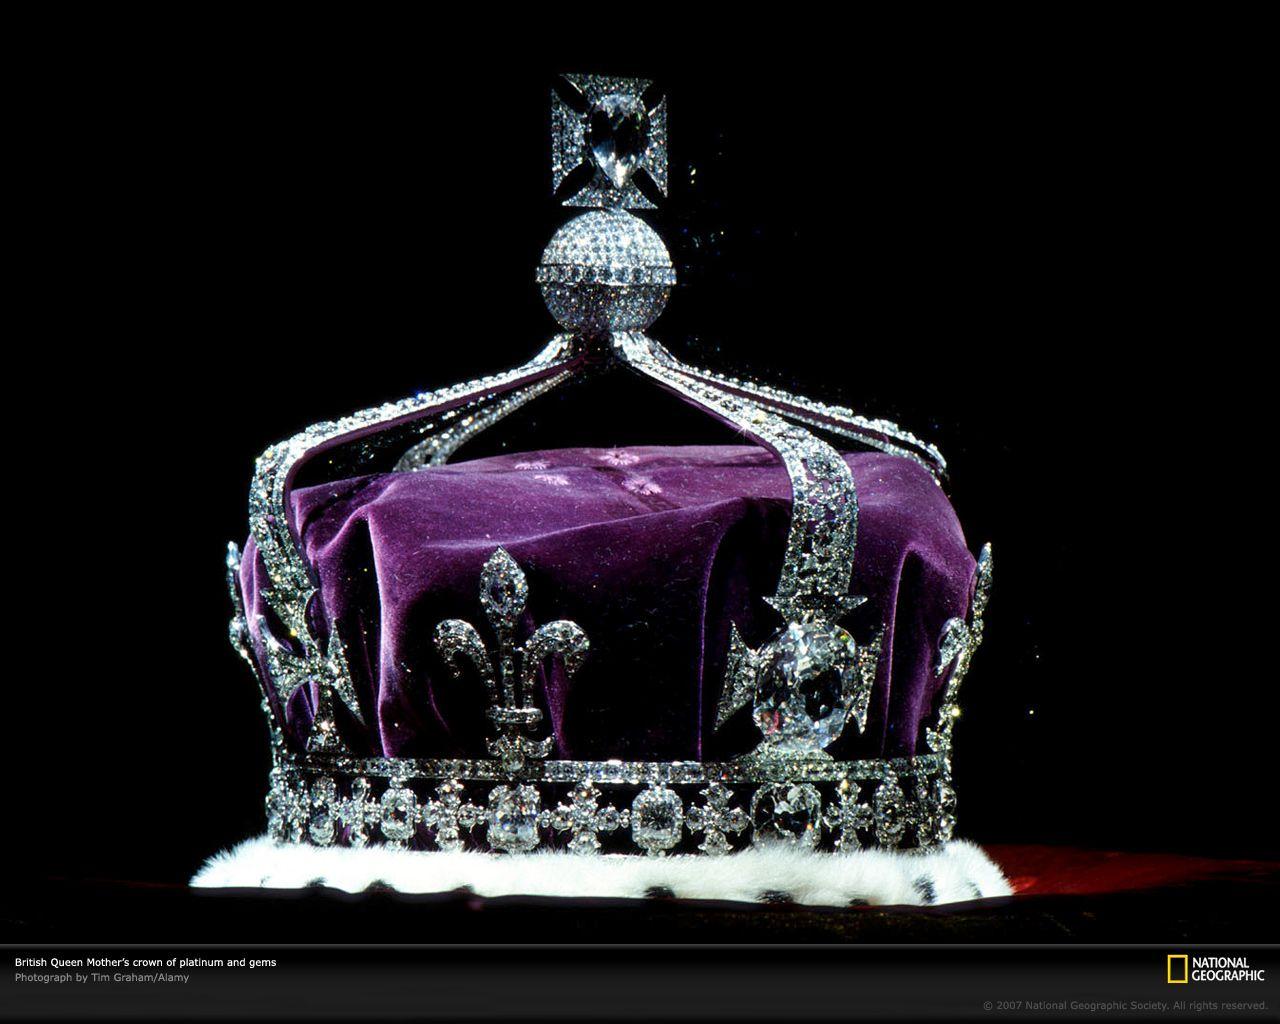 Koh-i-noor-diamond, 105 carats